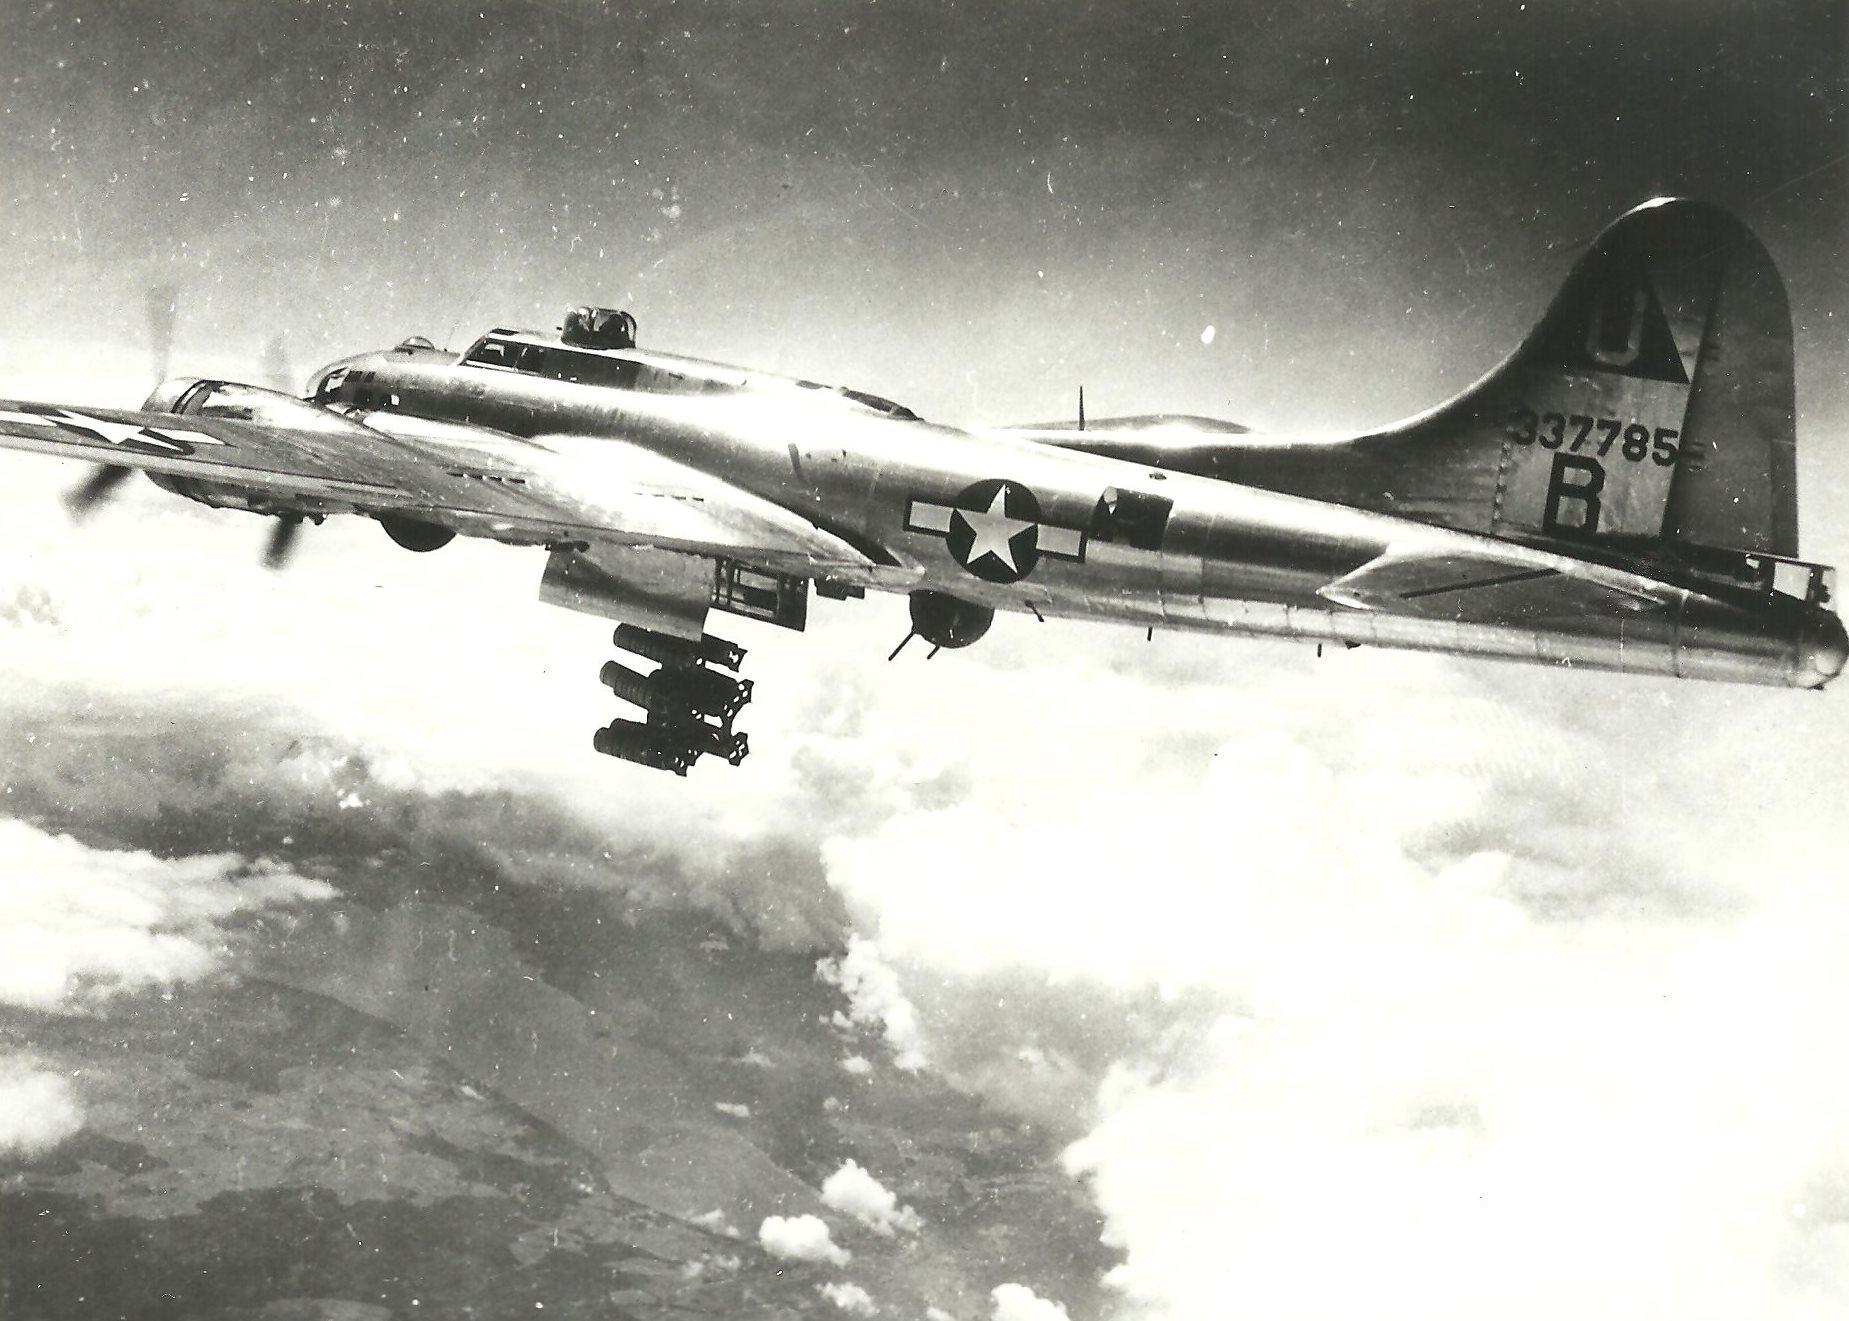 B-17 43-37785